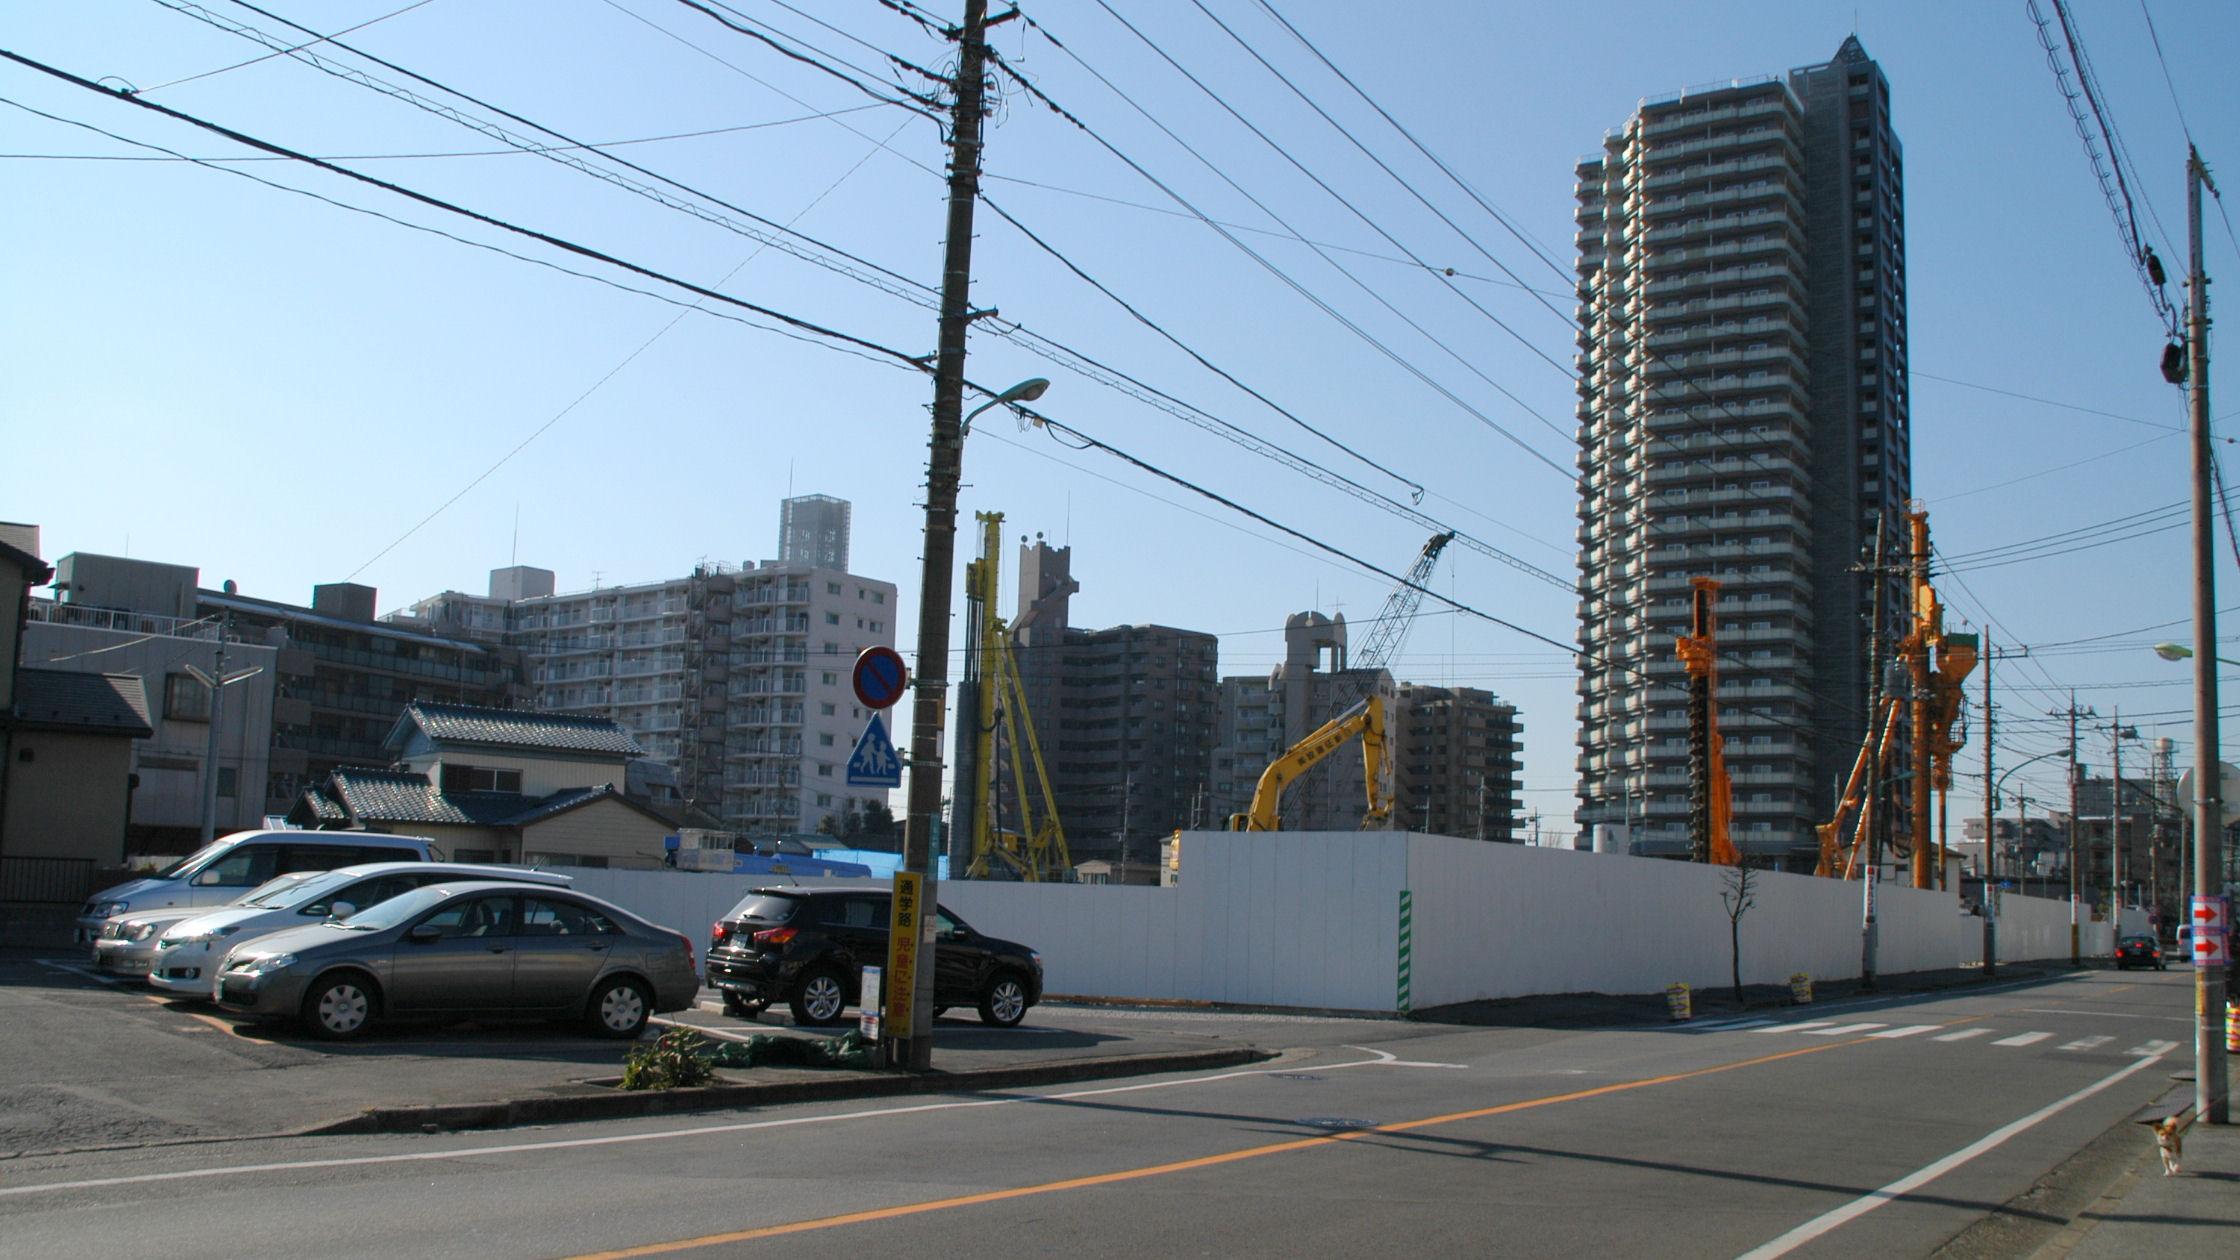 kanayama0021.jpg